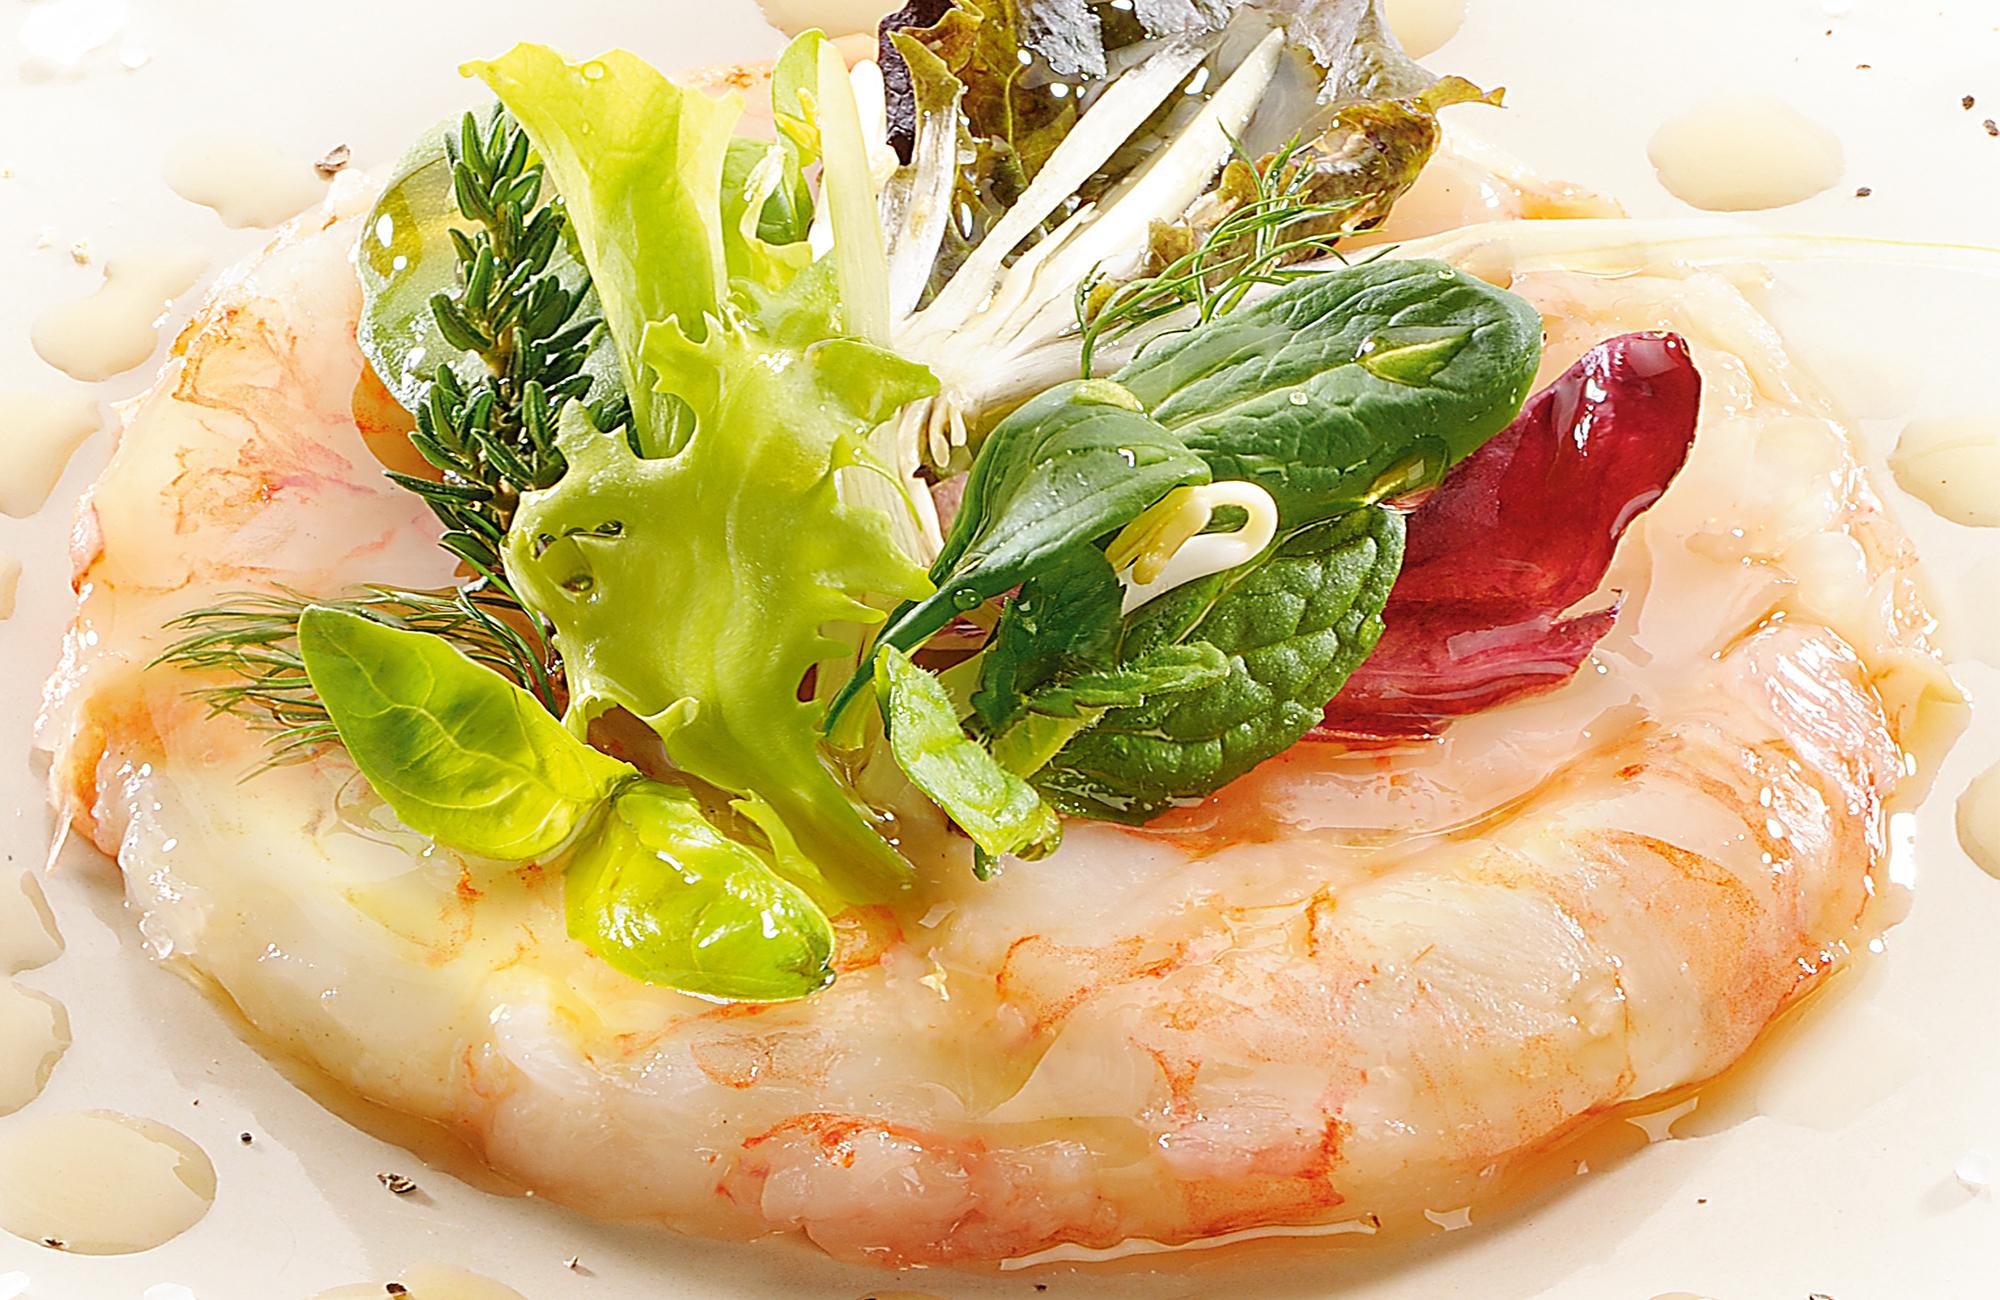 Battuto di gamberi marinati all'Aceto di Mele Ponti e insalatine novelle